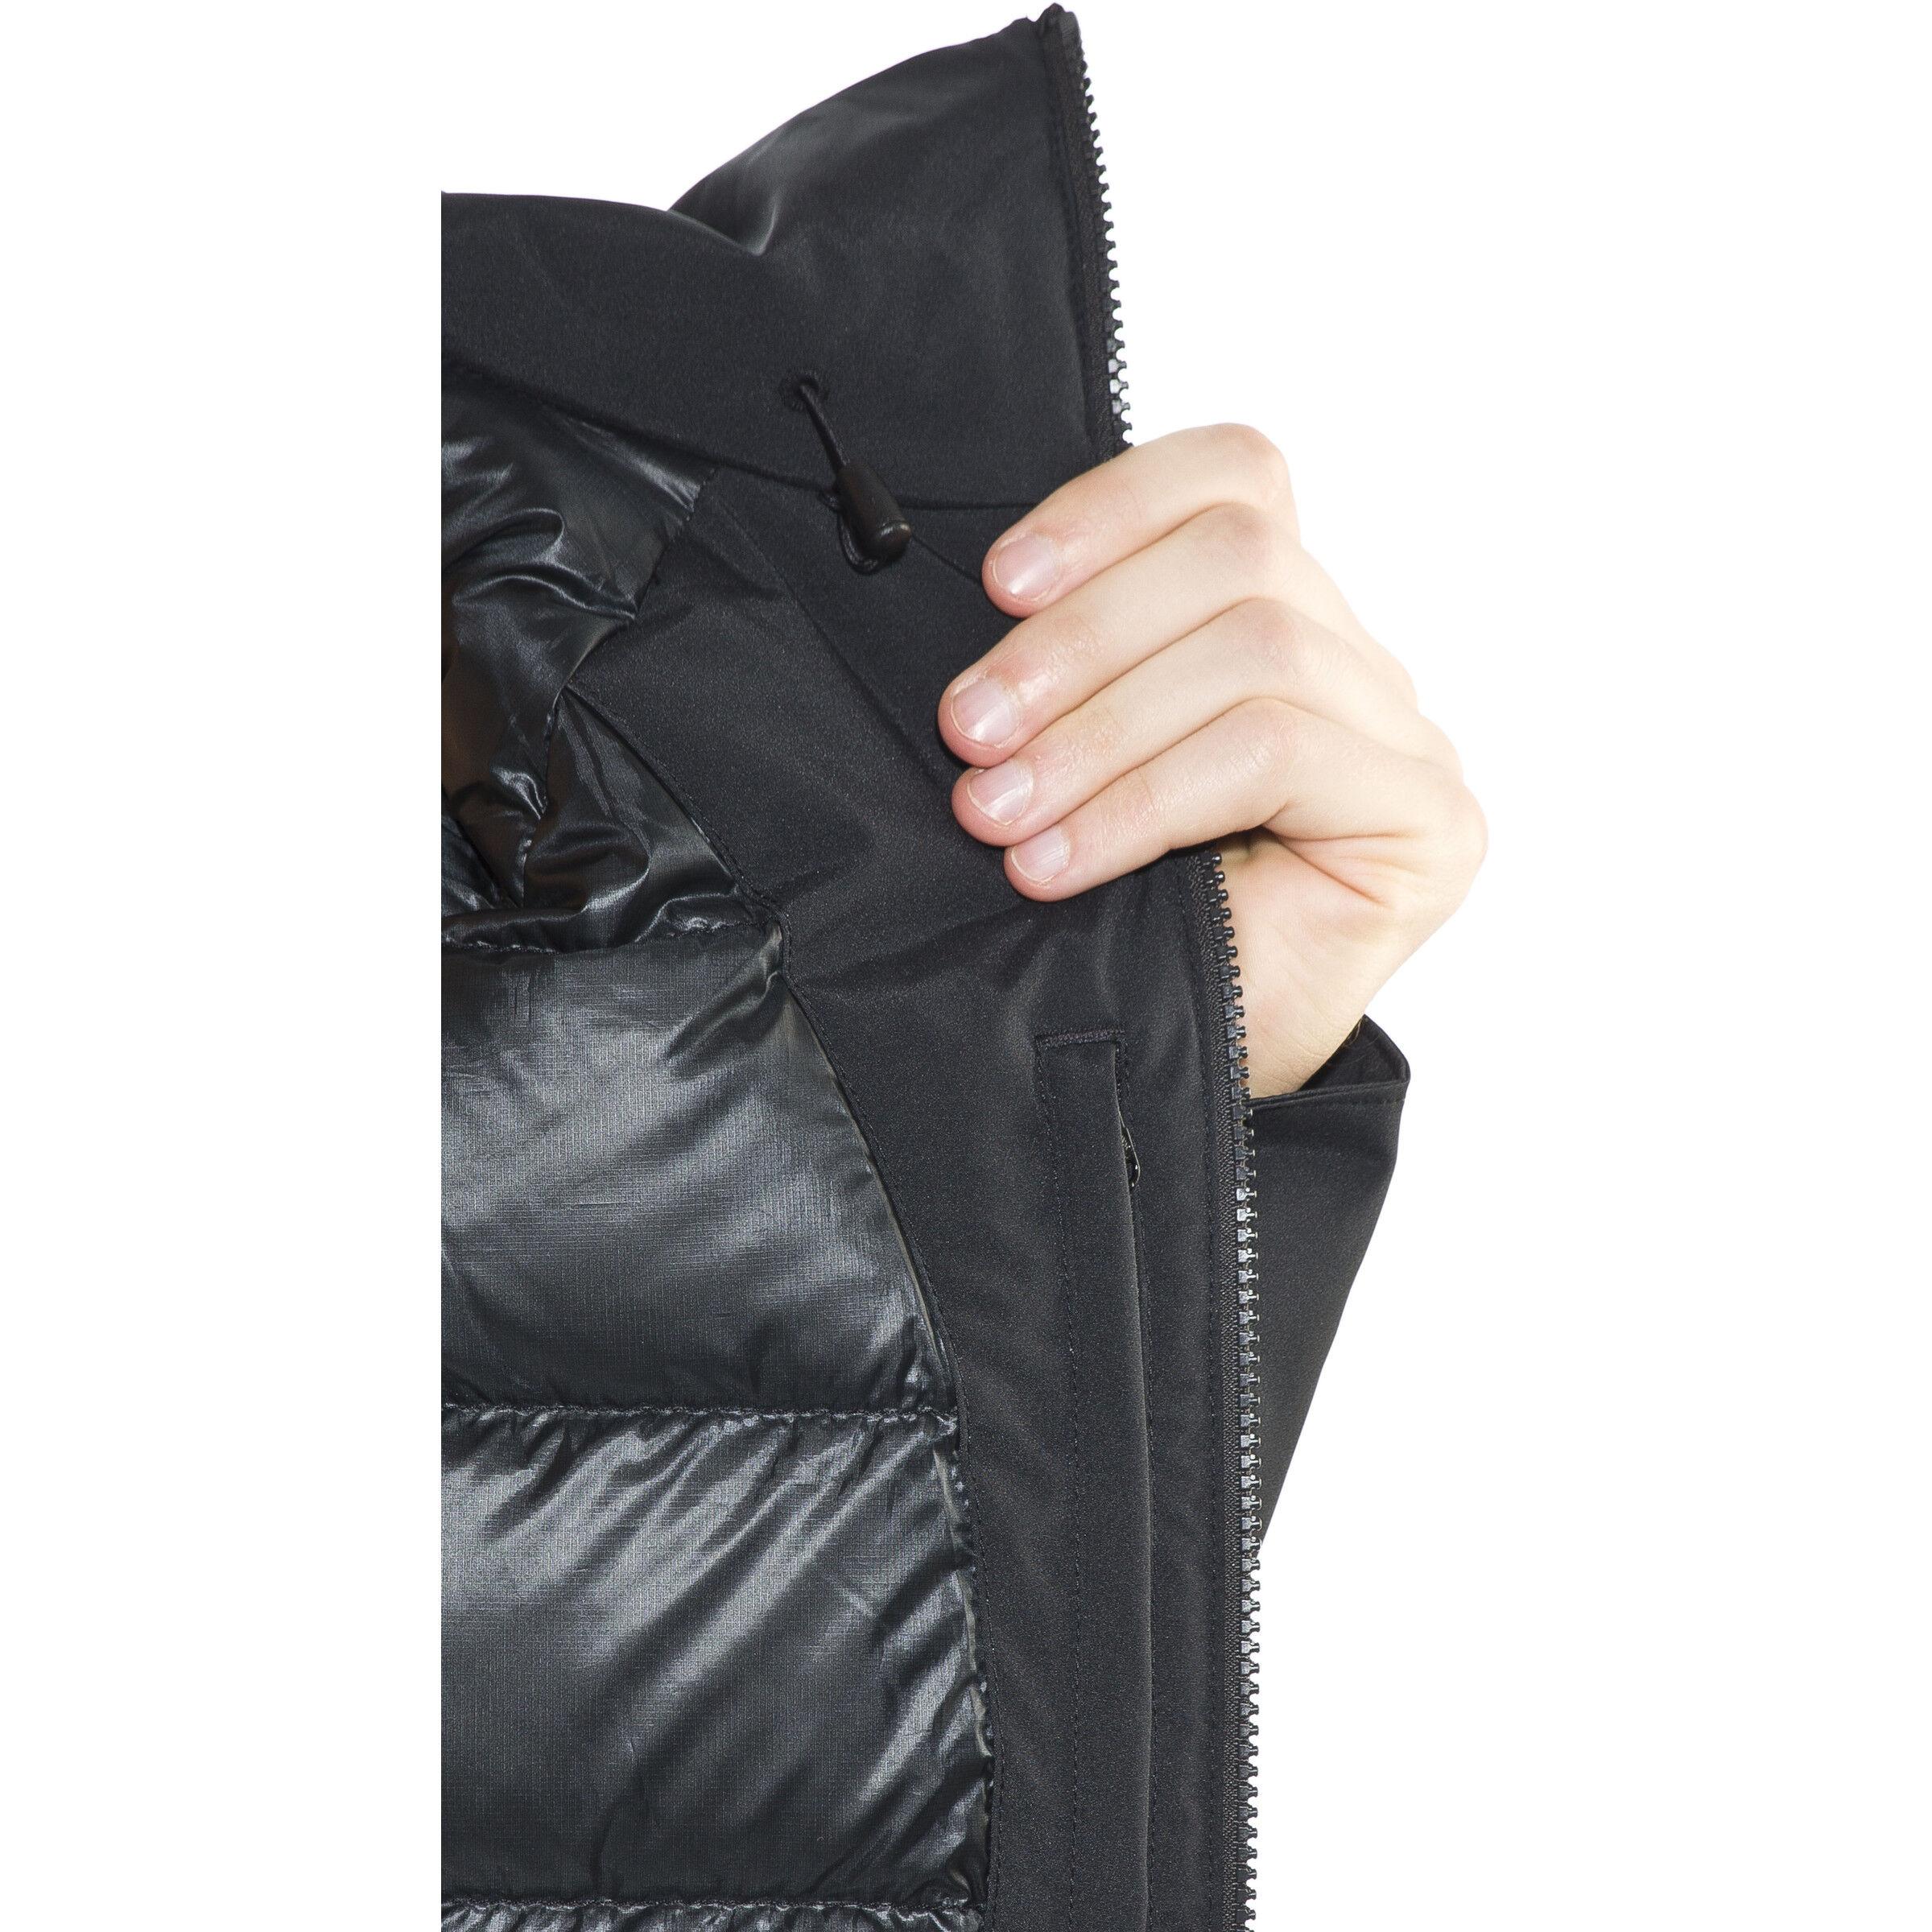 Yeti Reese Hardshell Down Jacket Herren black